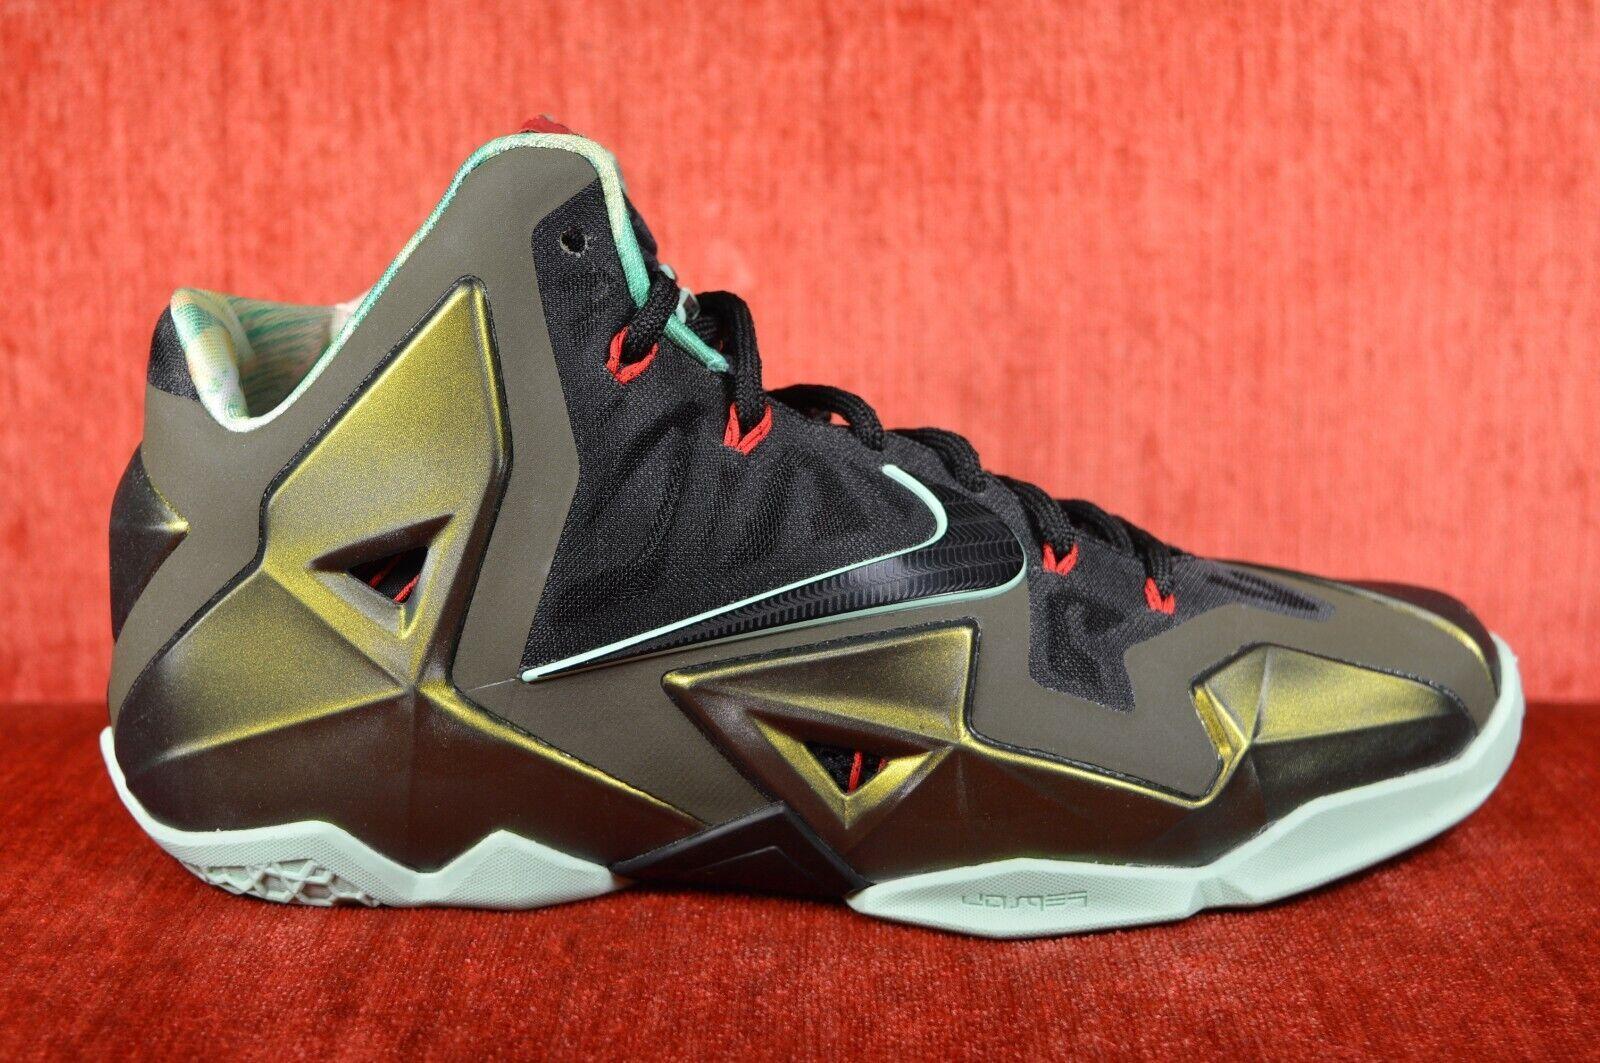 WORN ONCE Nike Lebron 11 XI King's Pride Size 9 616175-700